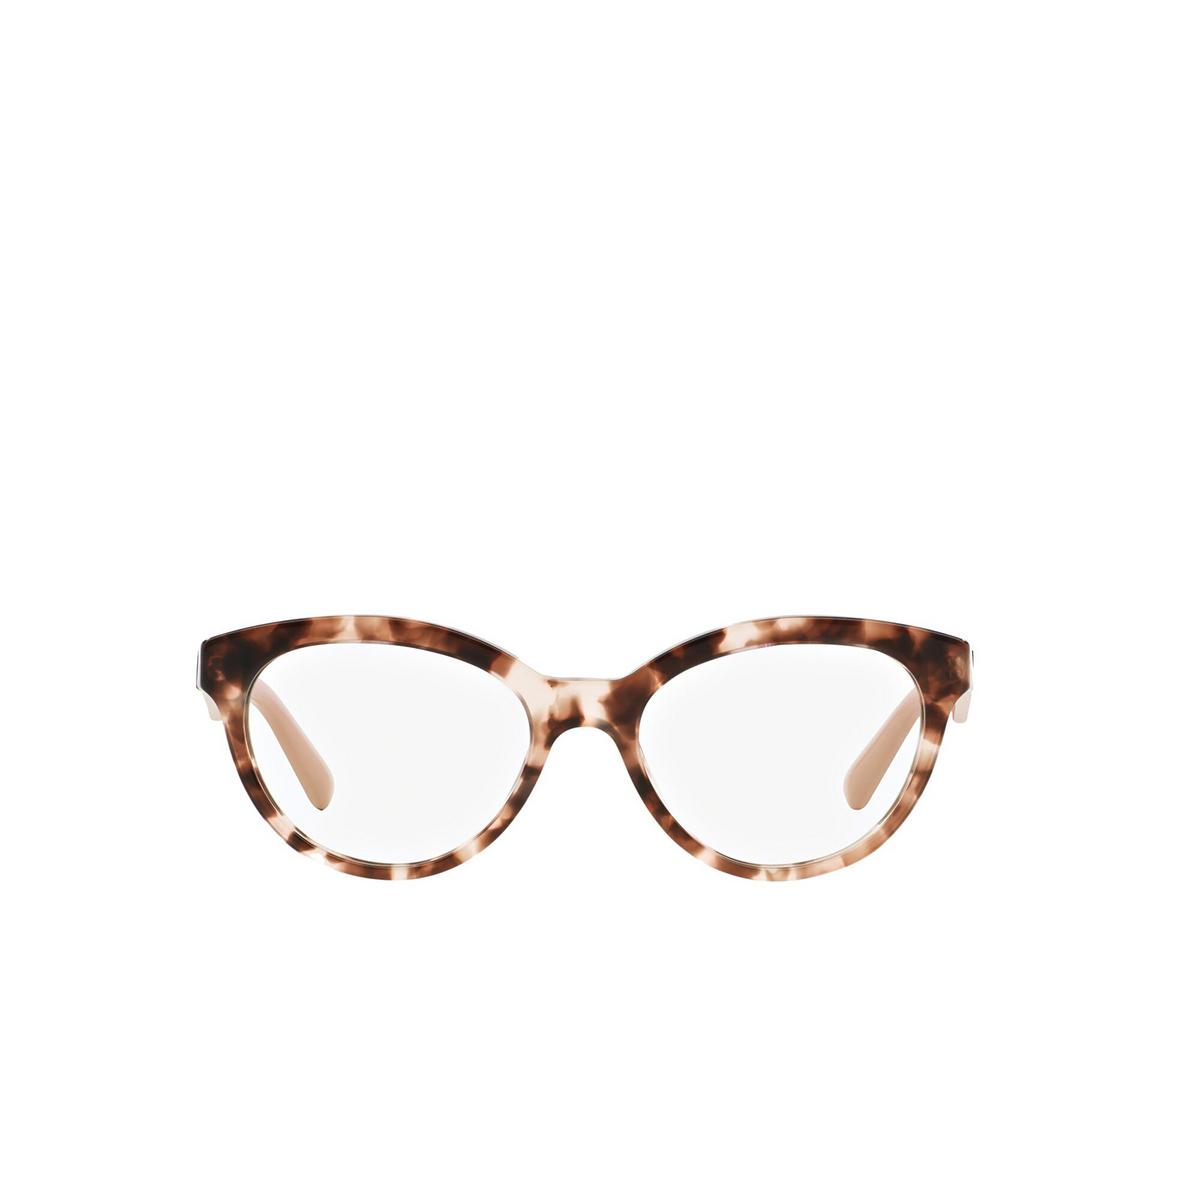 Prada® Square Eyeglasses: Heritage PR 11RV color Pink Havana ROJ1O1 - front view.